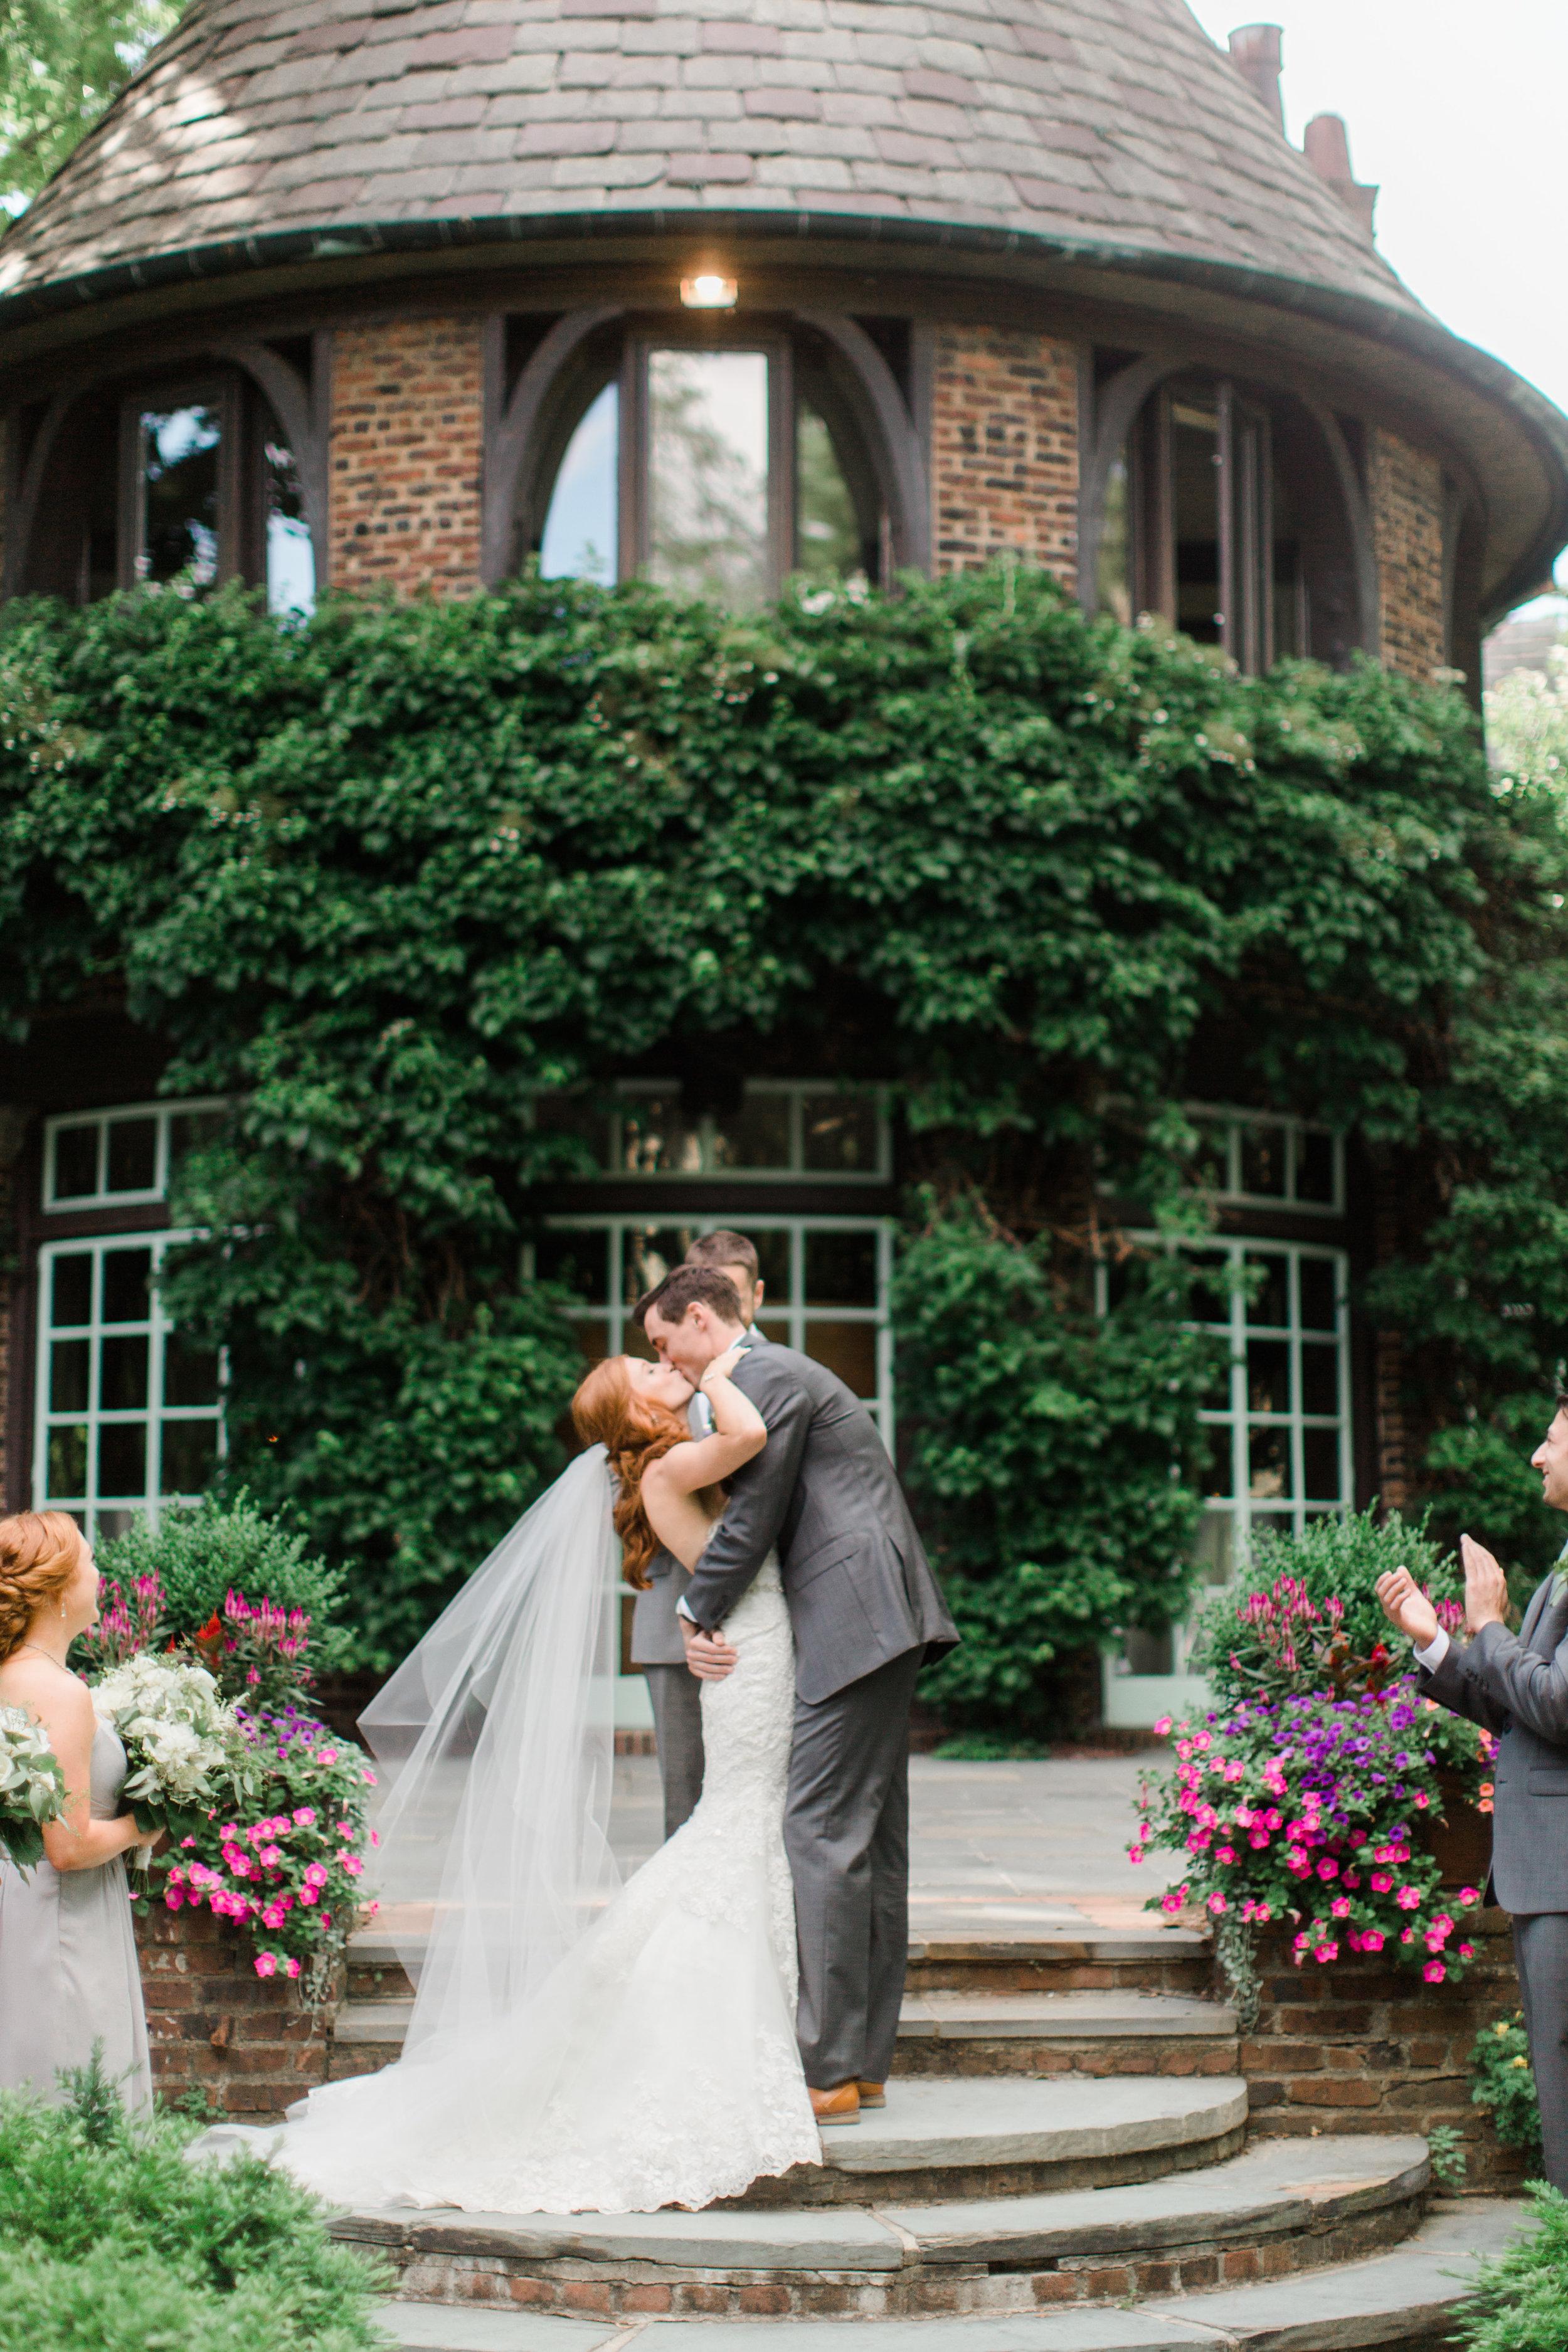 aliandcj_wedding (1103 of 2178).jpg